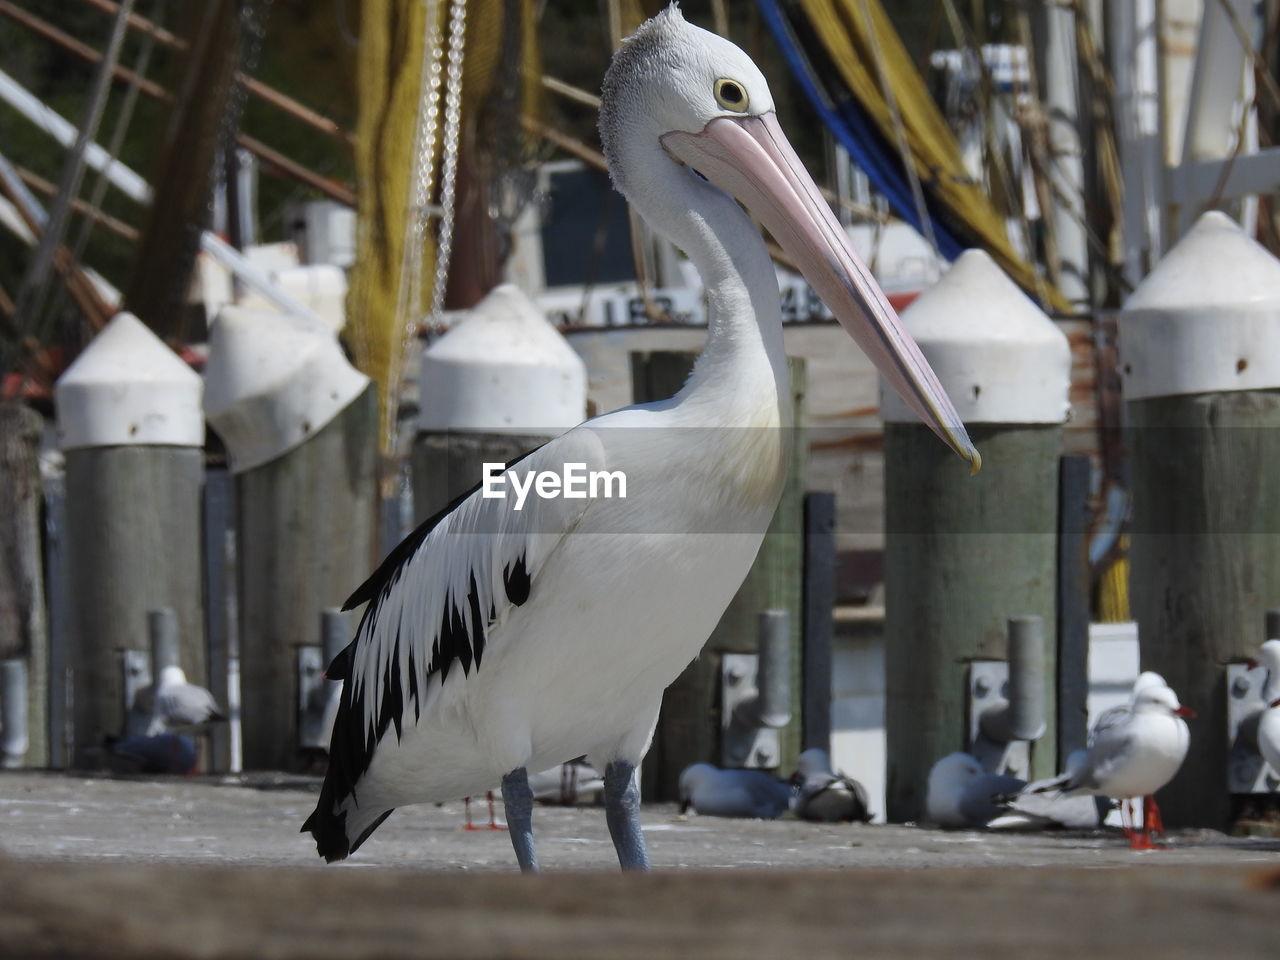 bird, animal themes, animals in the wild, animal wildlife, white color, beak, one animal, day, perching, pelican, crane - bird, no people, nature, outdoors, close-up